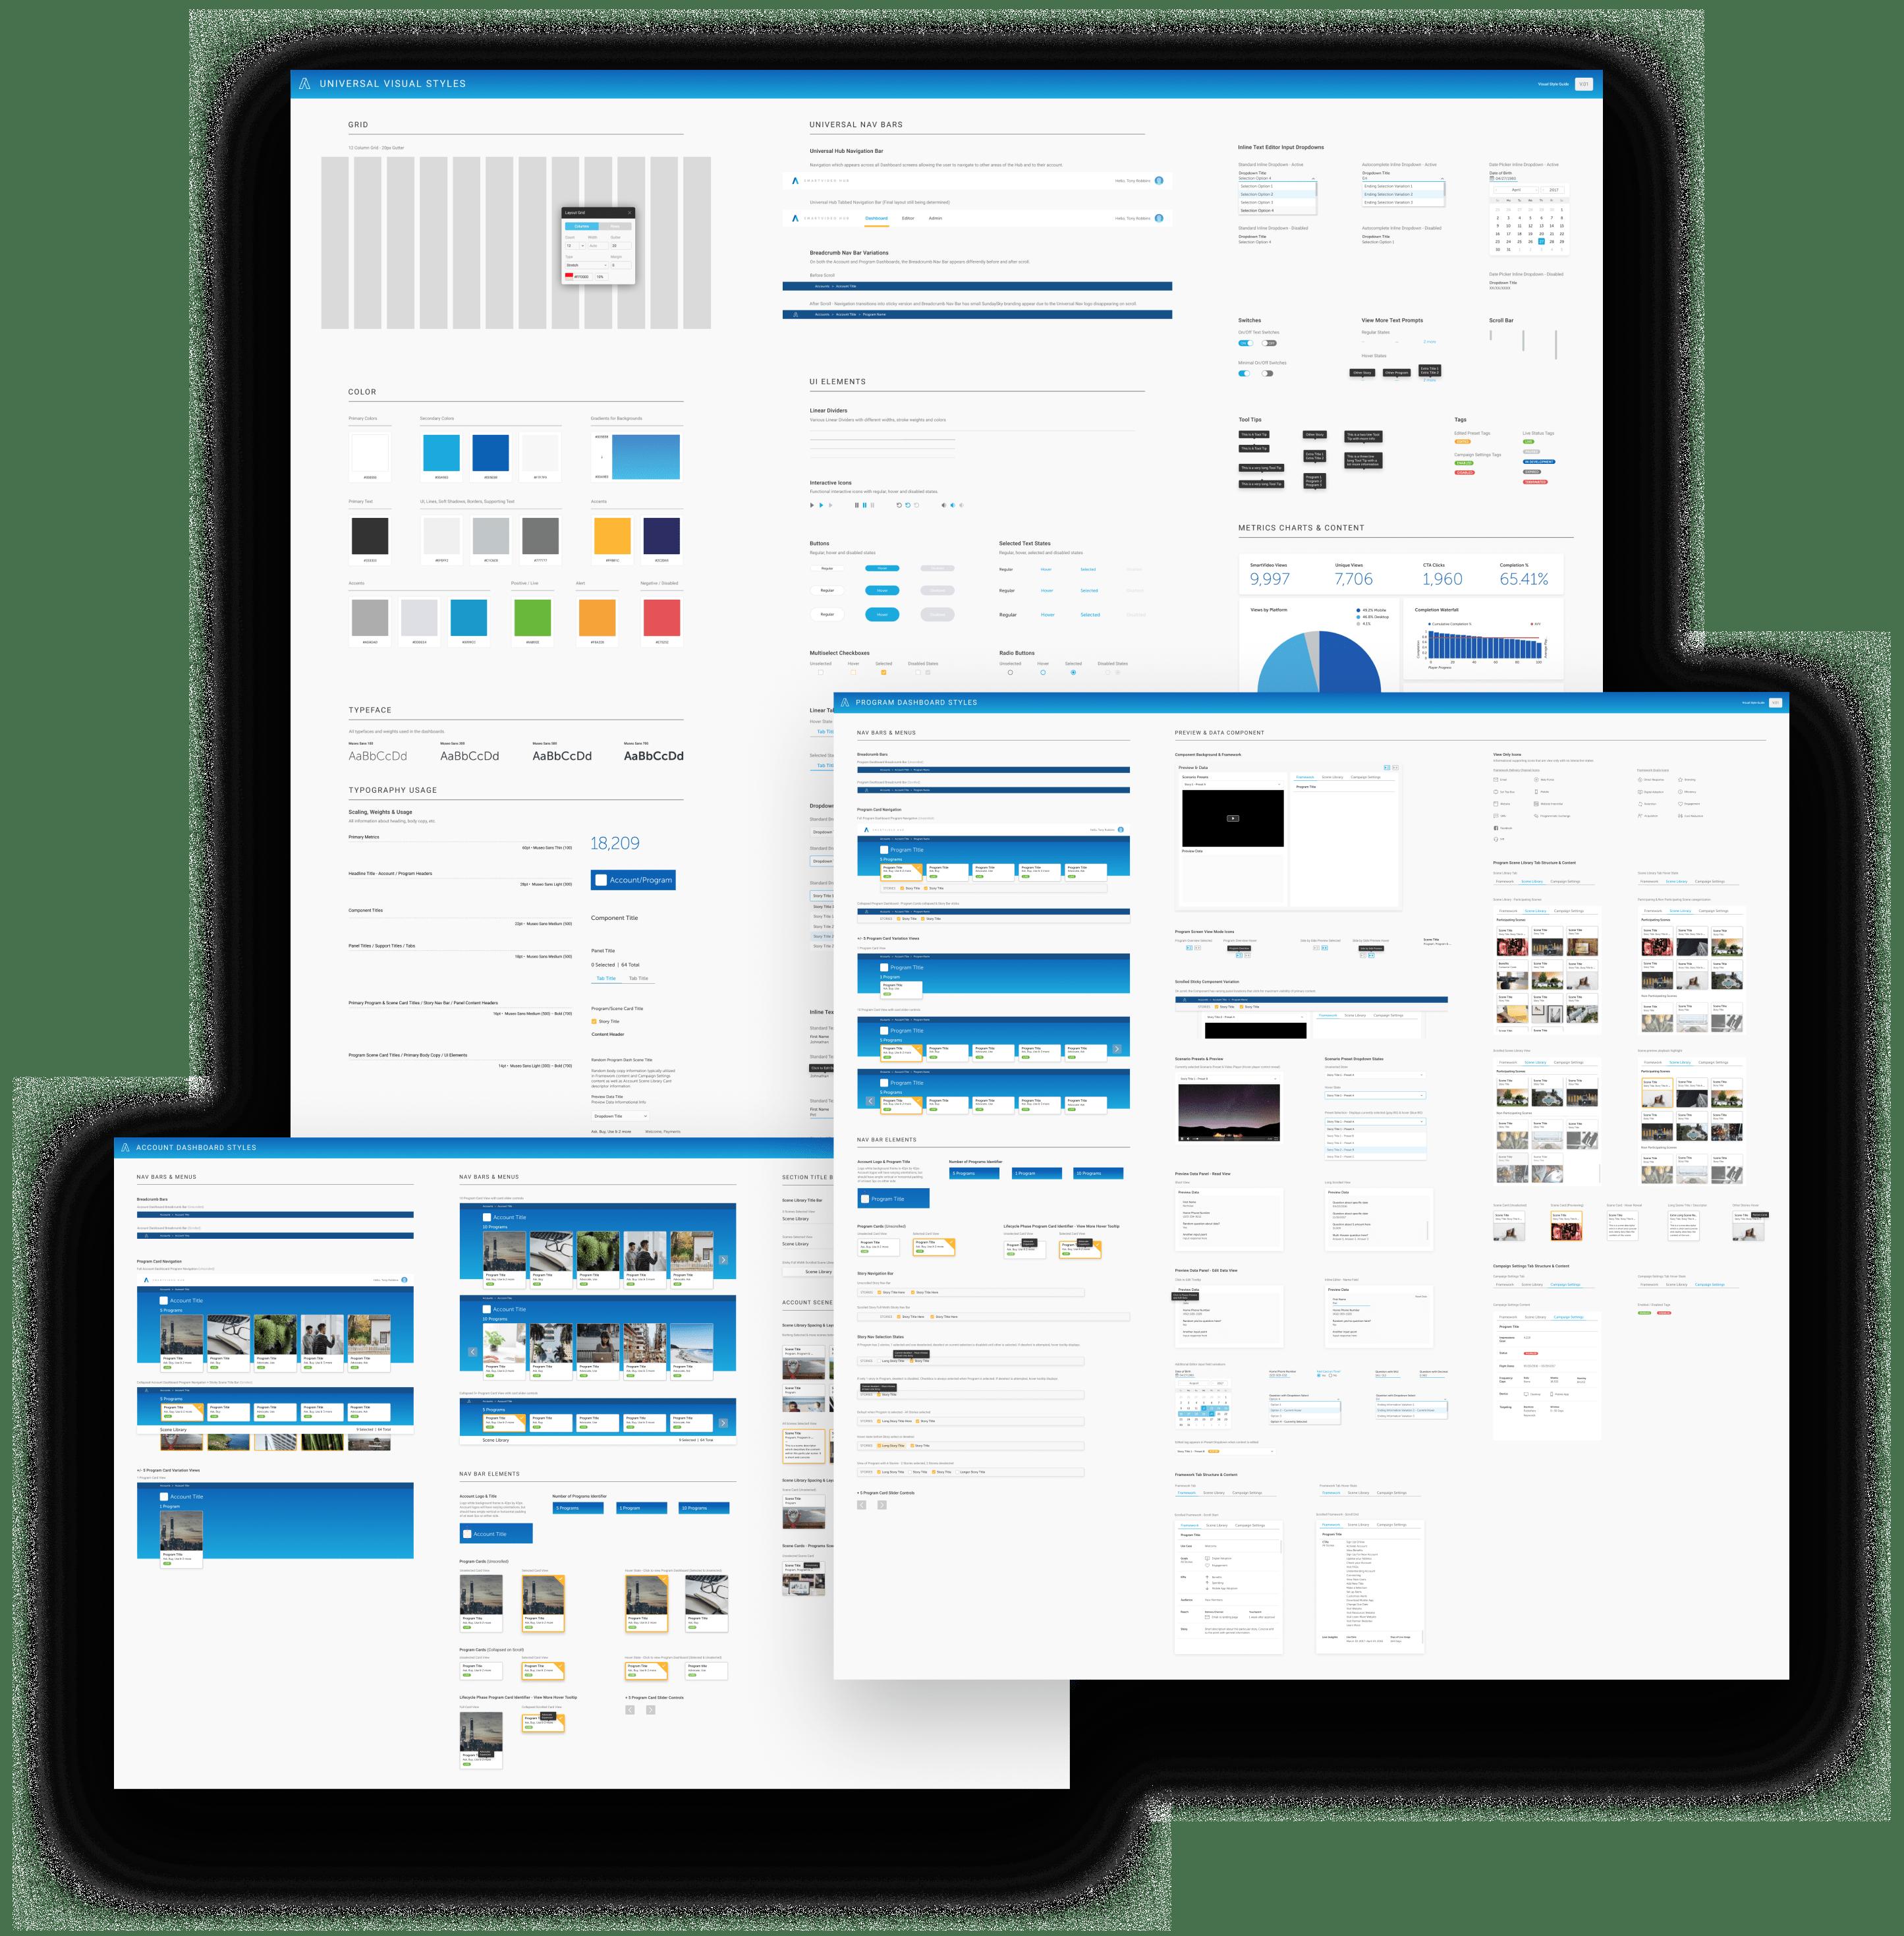 SSWeb-SundaySky-Components&UsageGuidelines_Compiled